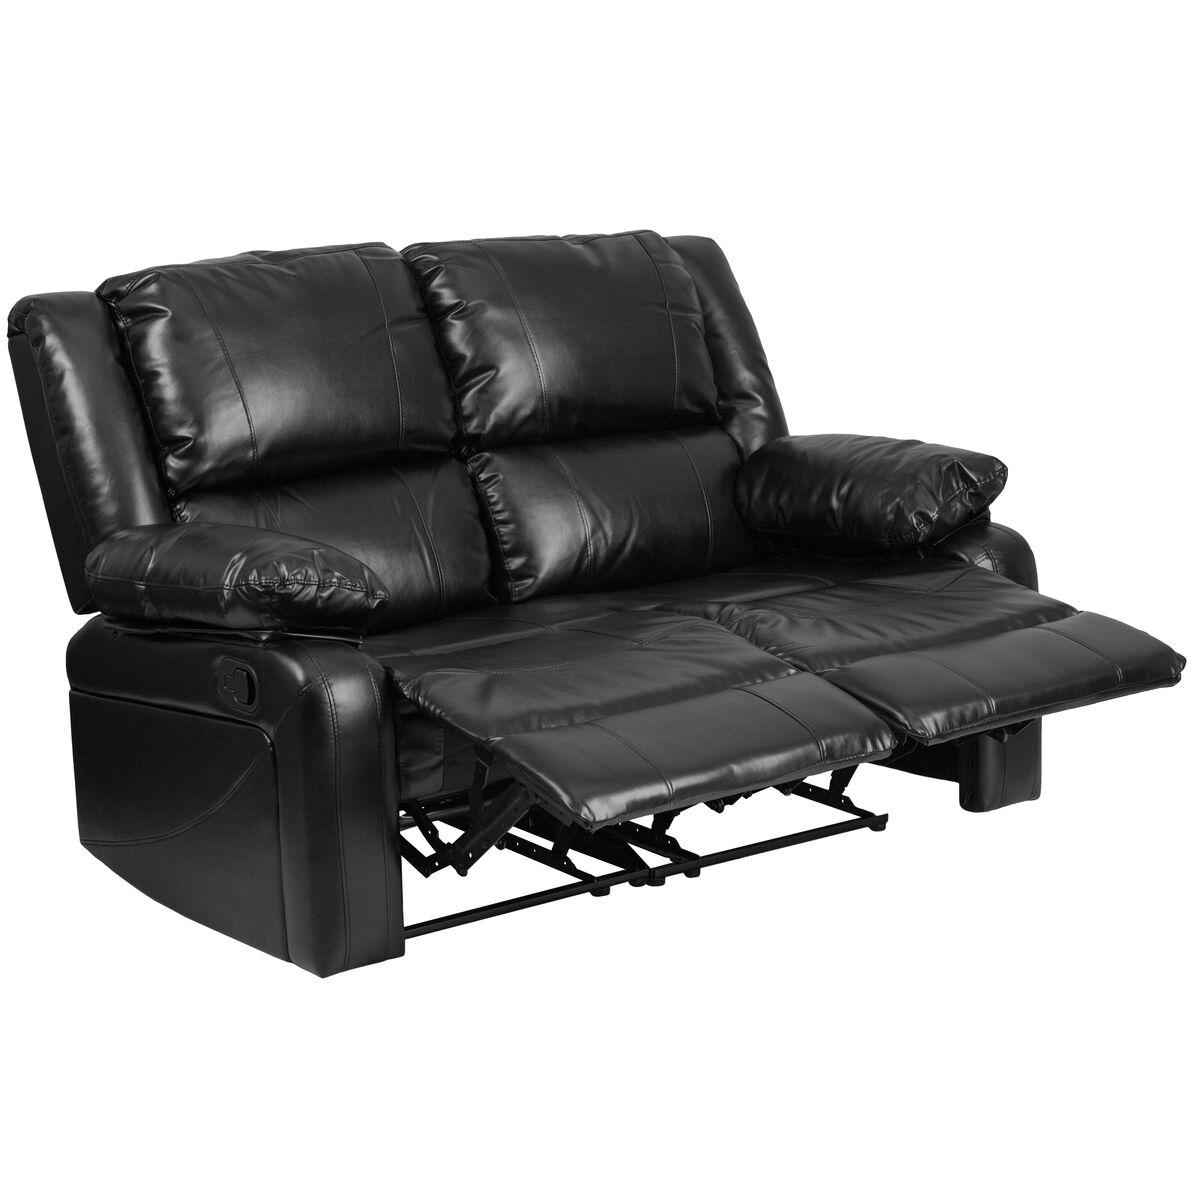 Super Harmony Series Black Leather Loveseat With Two Built In Recliners Inzonedesignstudio Interior Chair Design Inzonedesignstudiocom